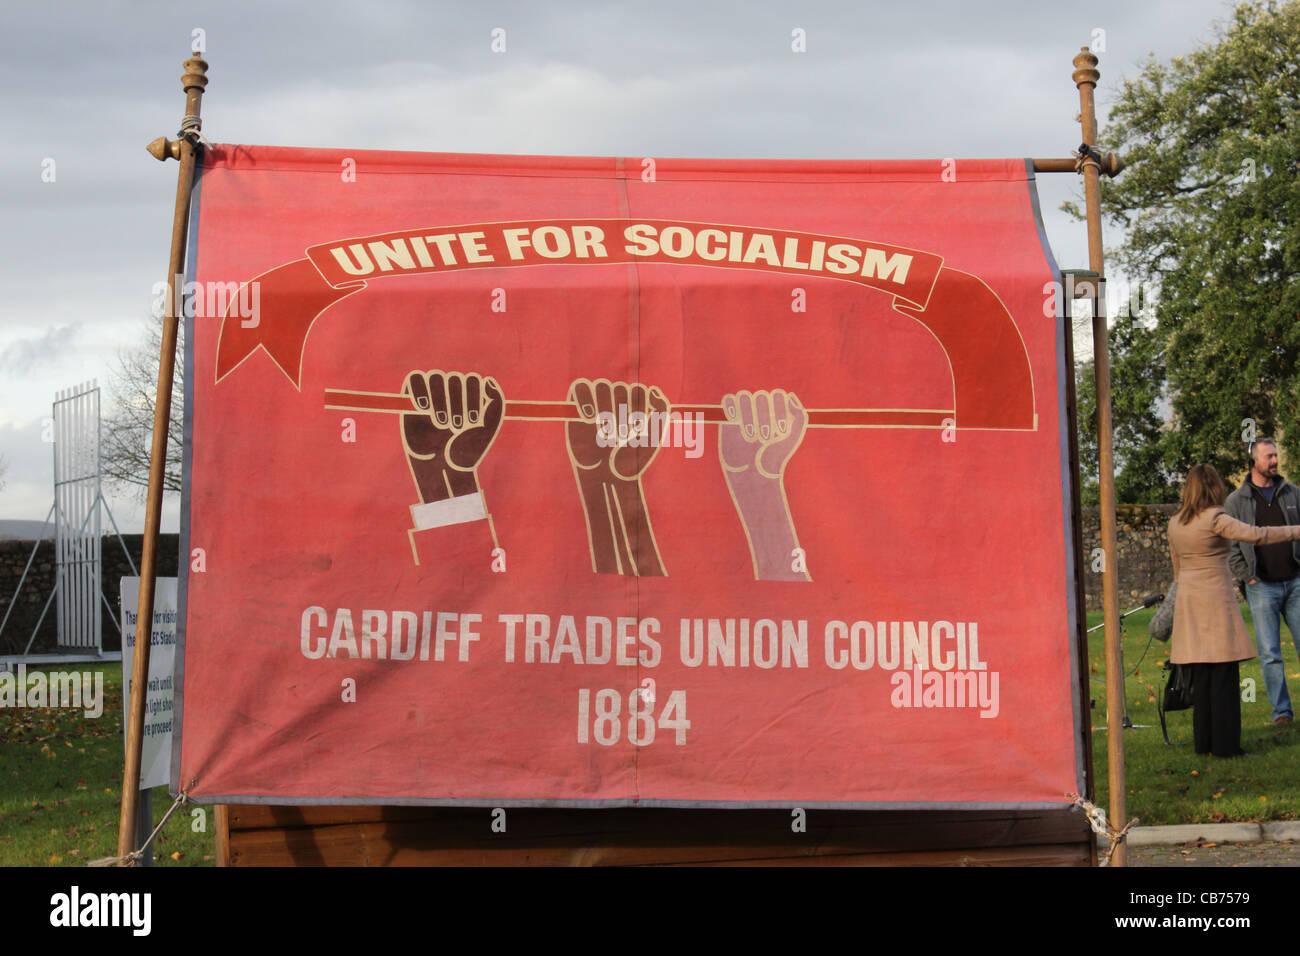 CARDIFF, UK, 30th November 2011. Trade Unionists socialism banner. - Stock Image